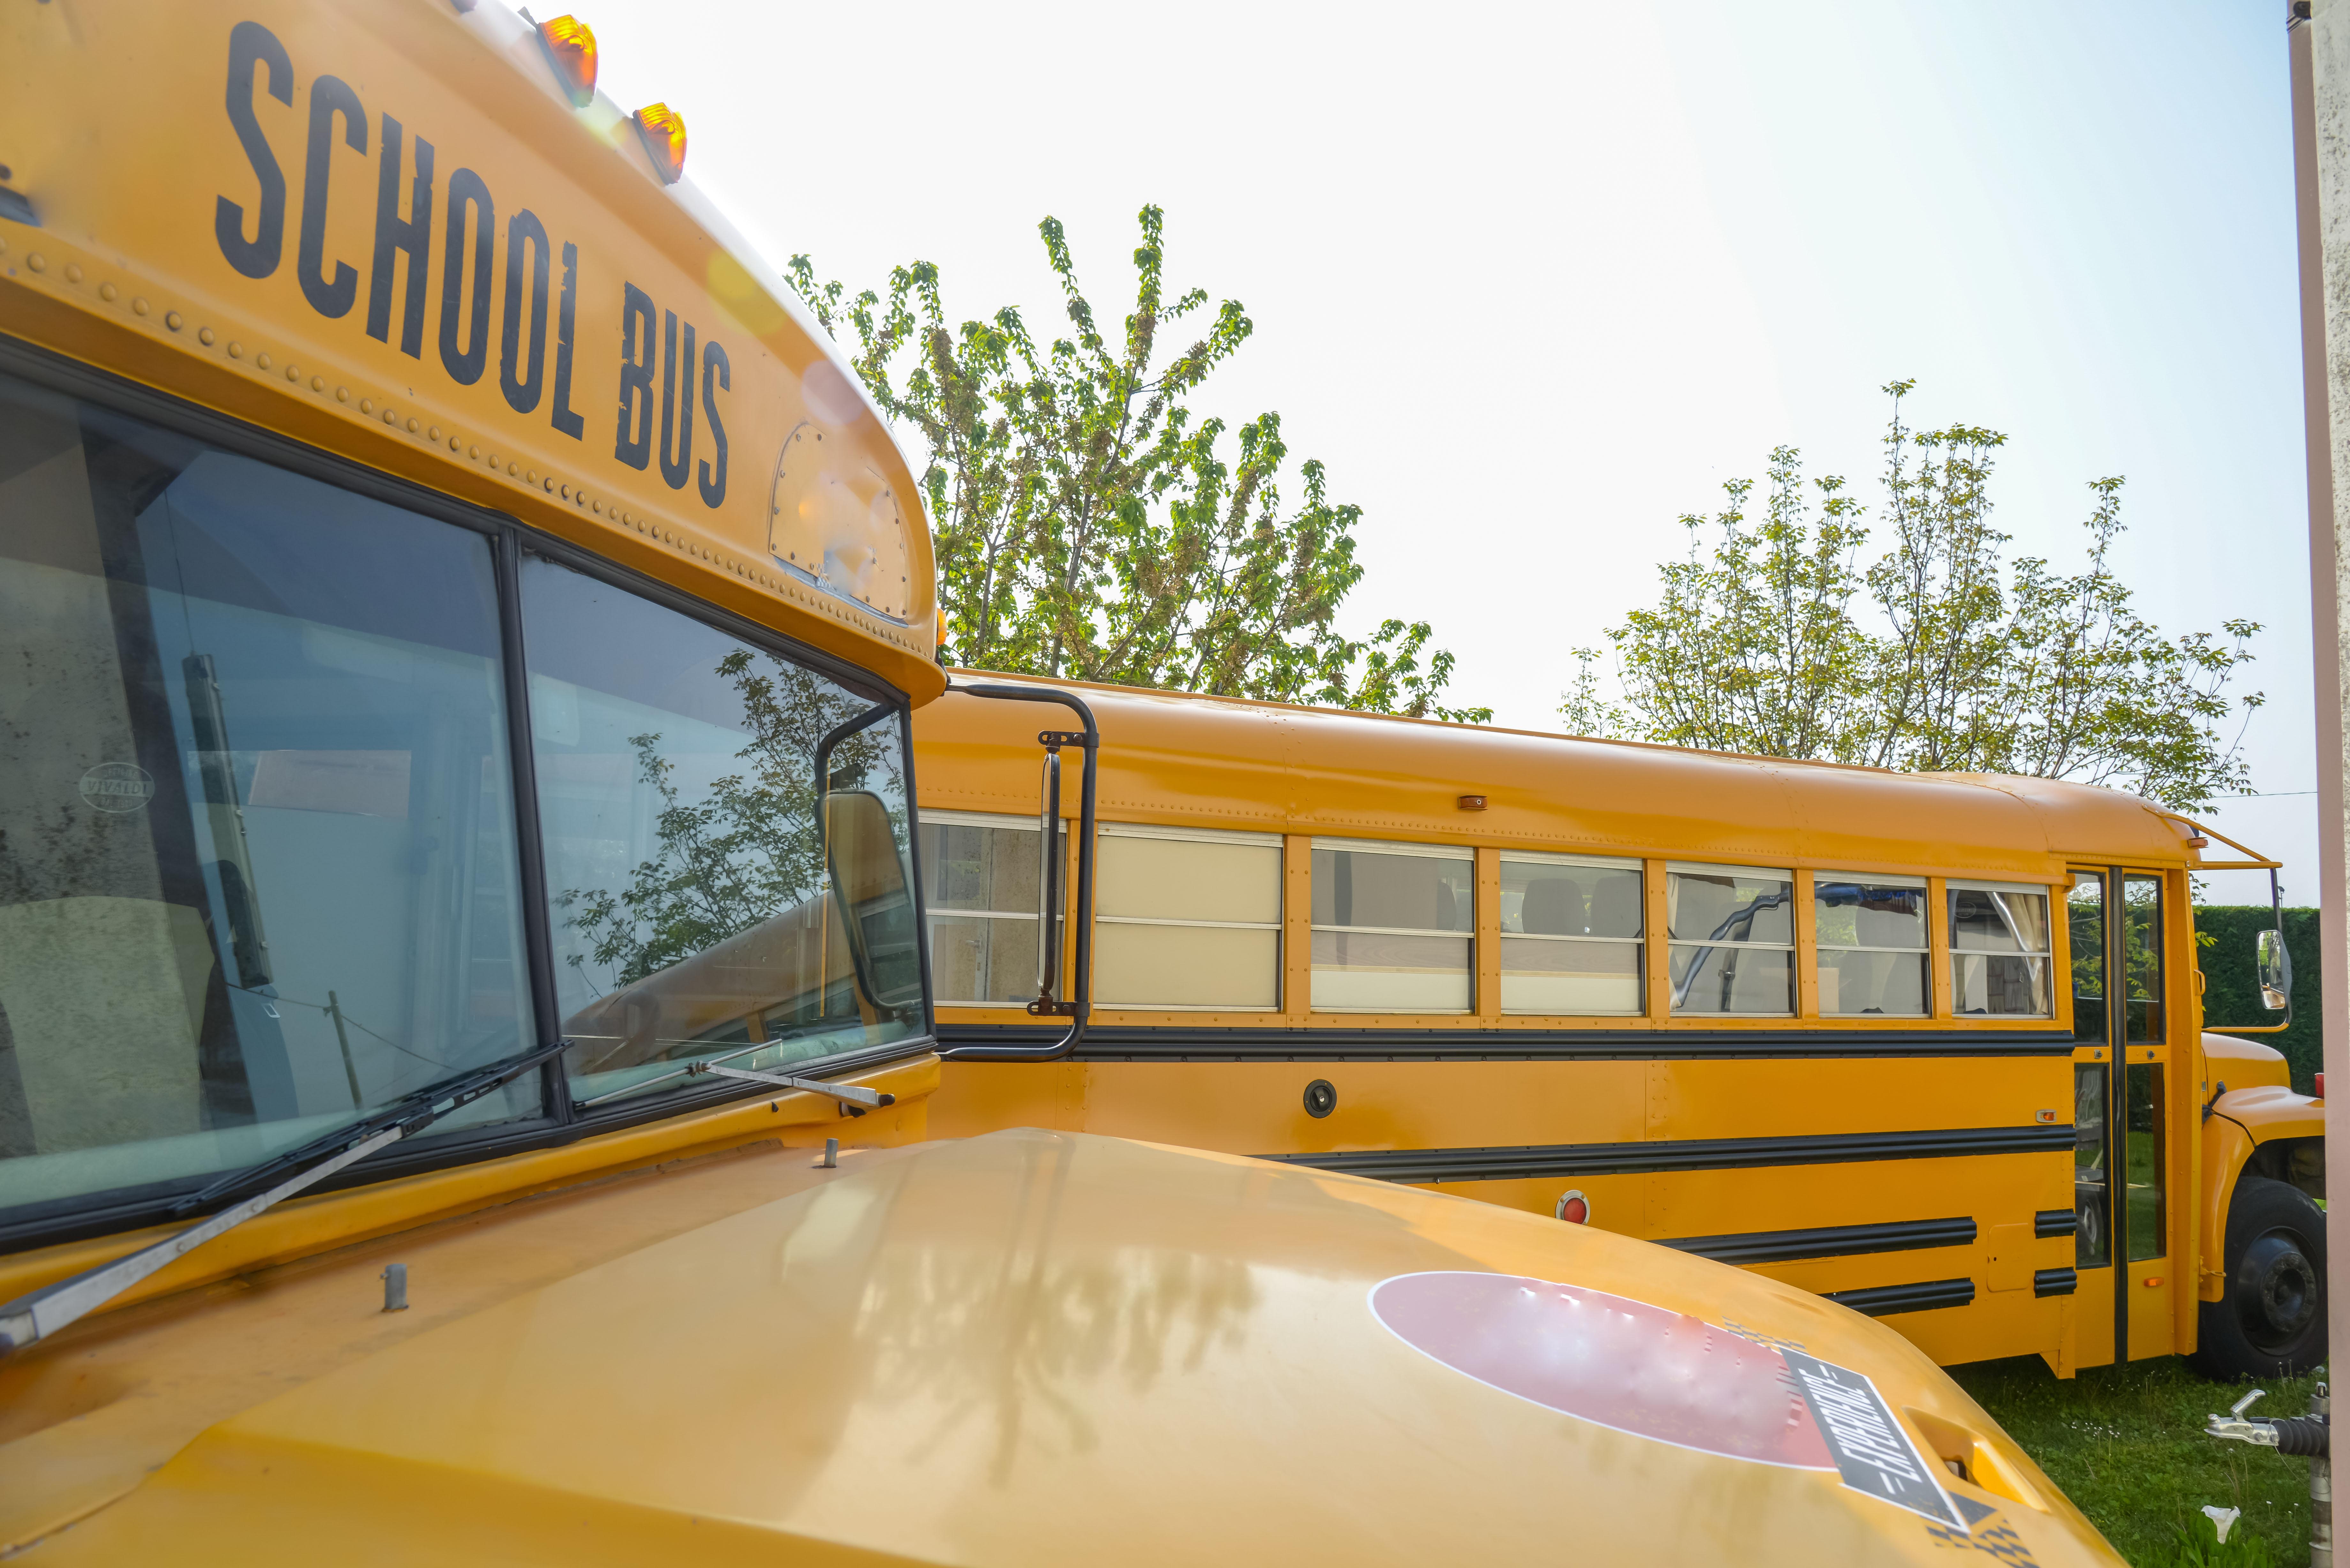 2 School Bus -6